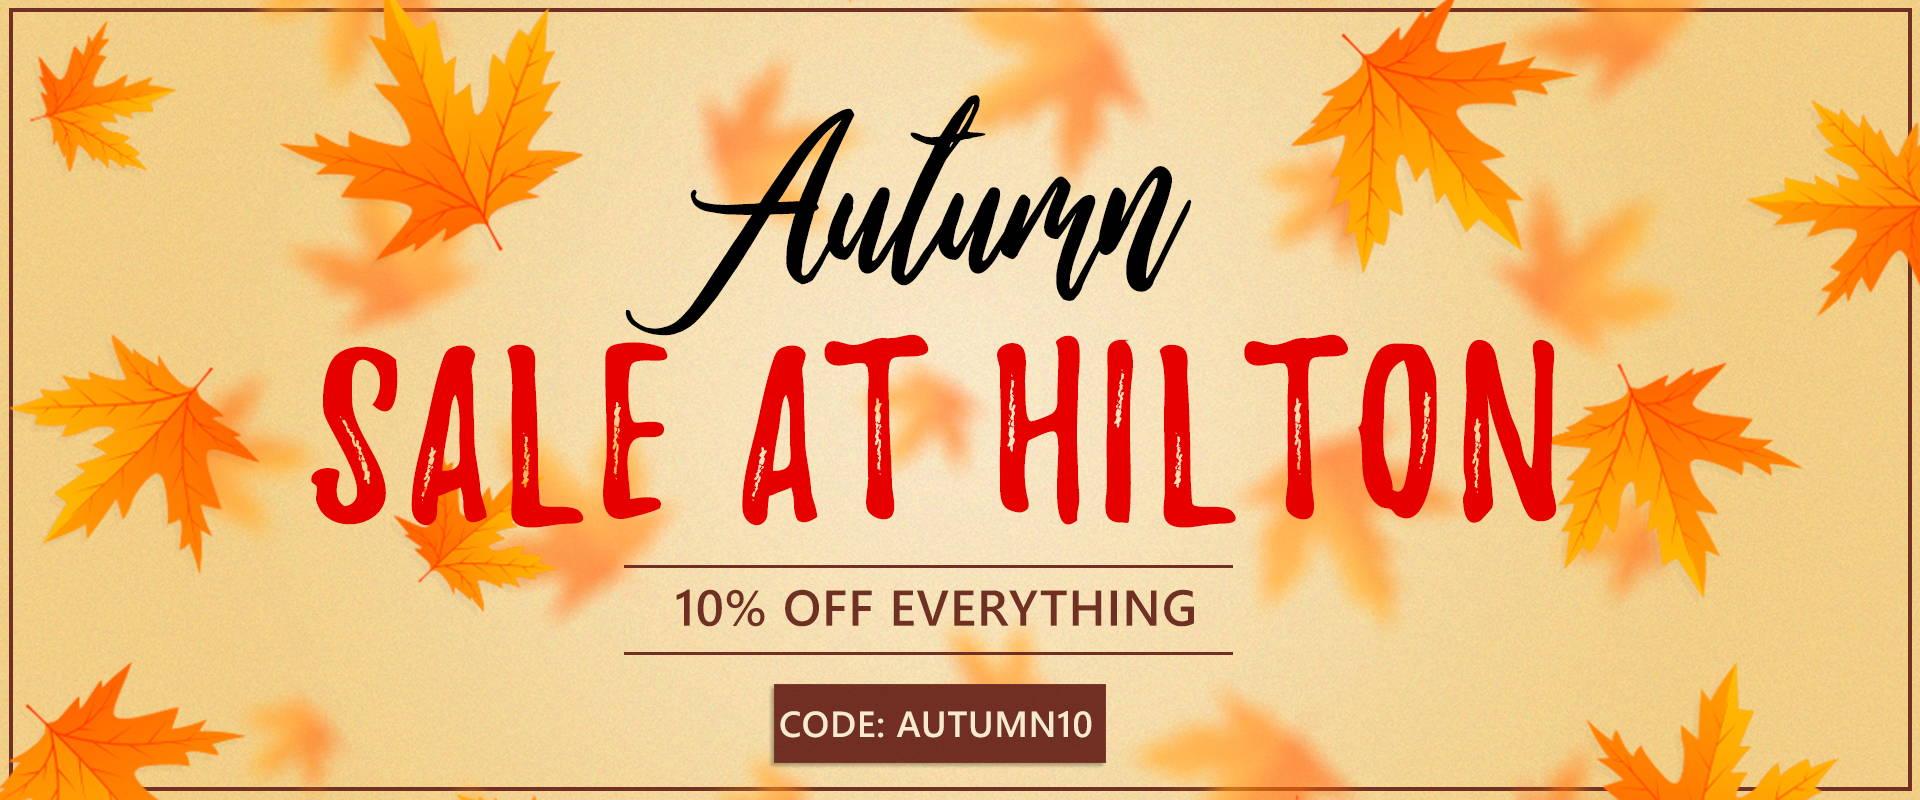 sale now on at hilton textiles. code: autumn10